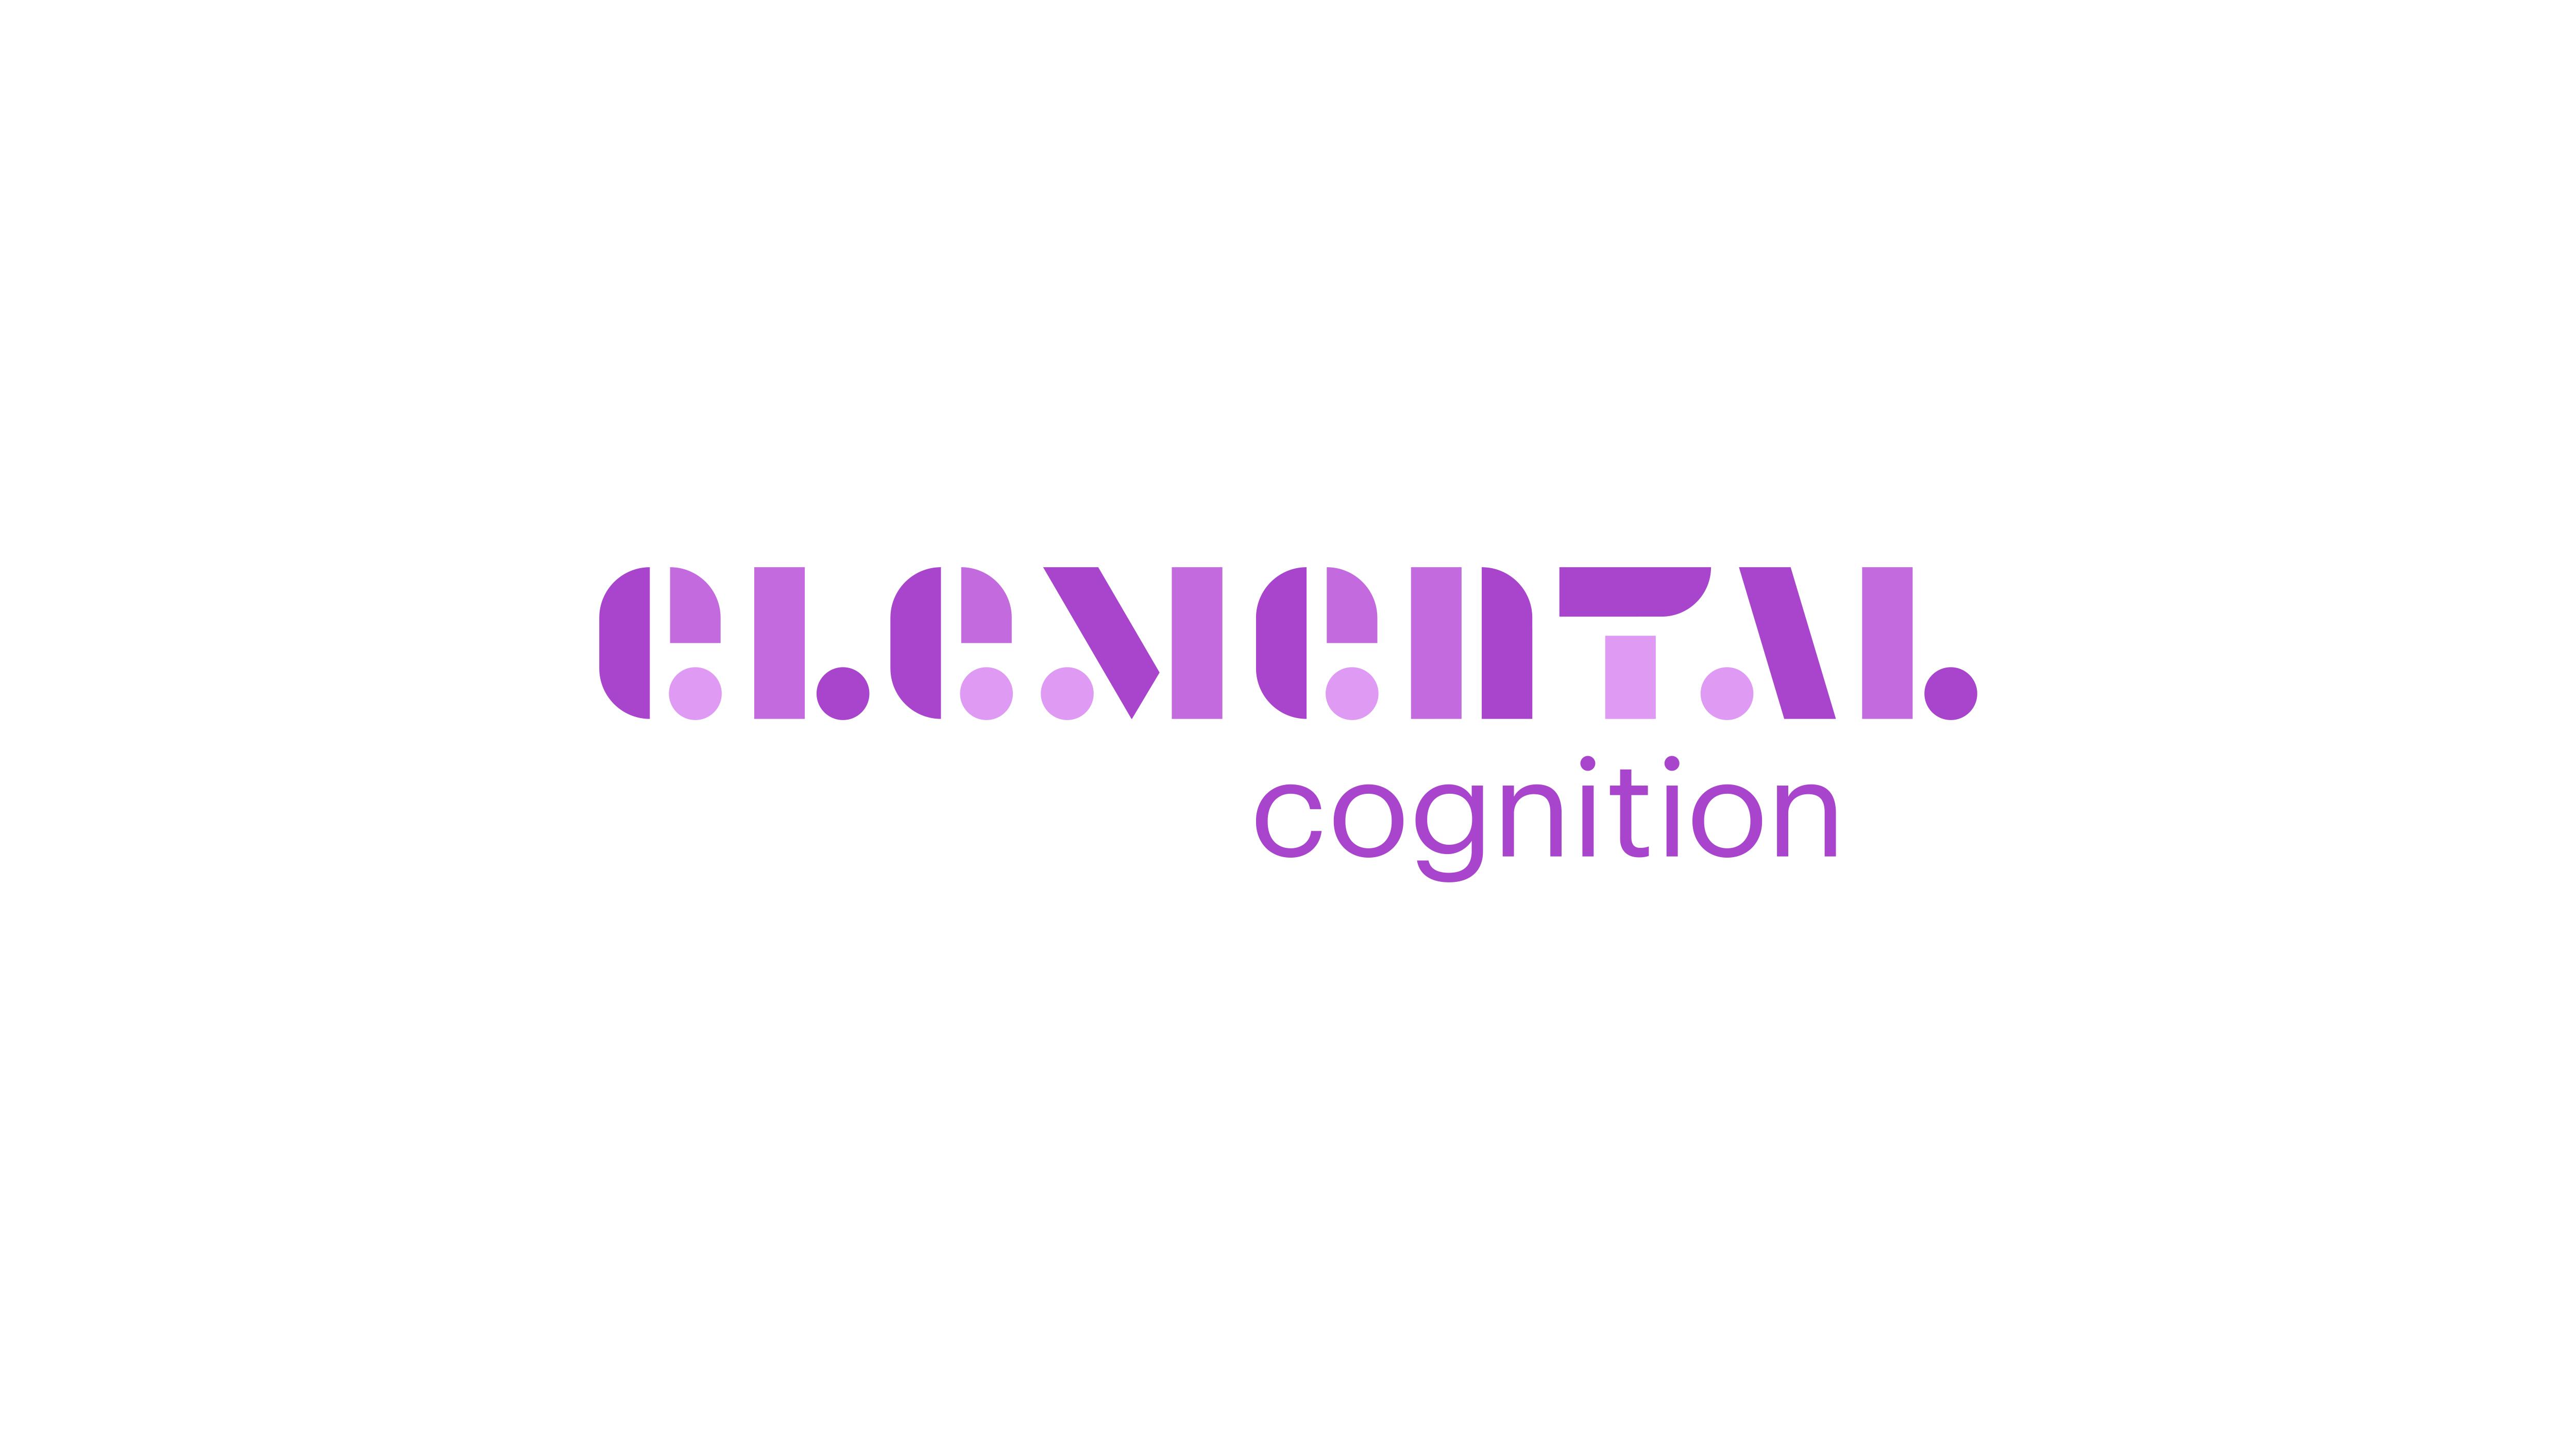 Elemental Cognition Branding